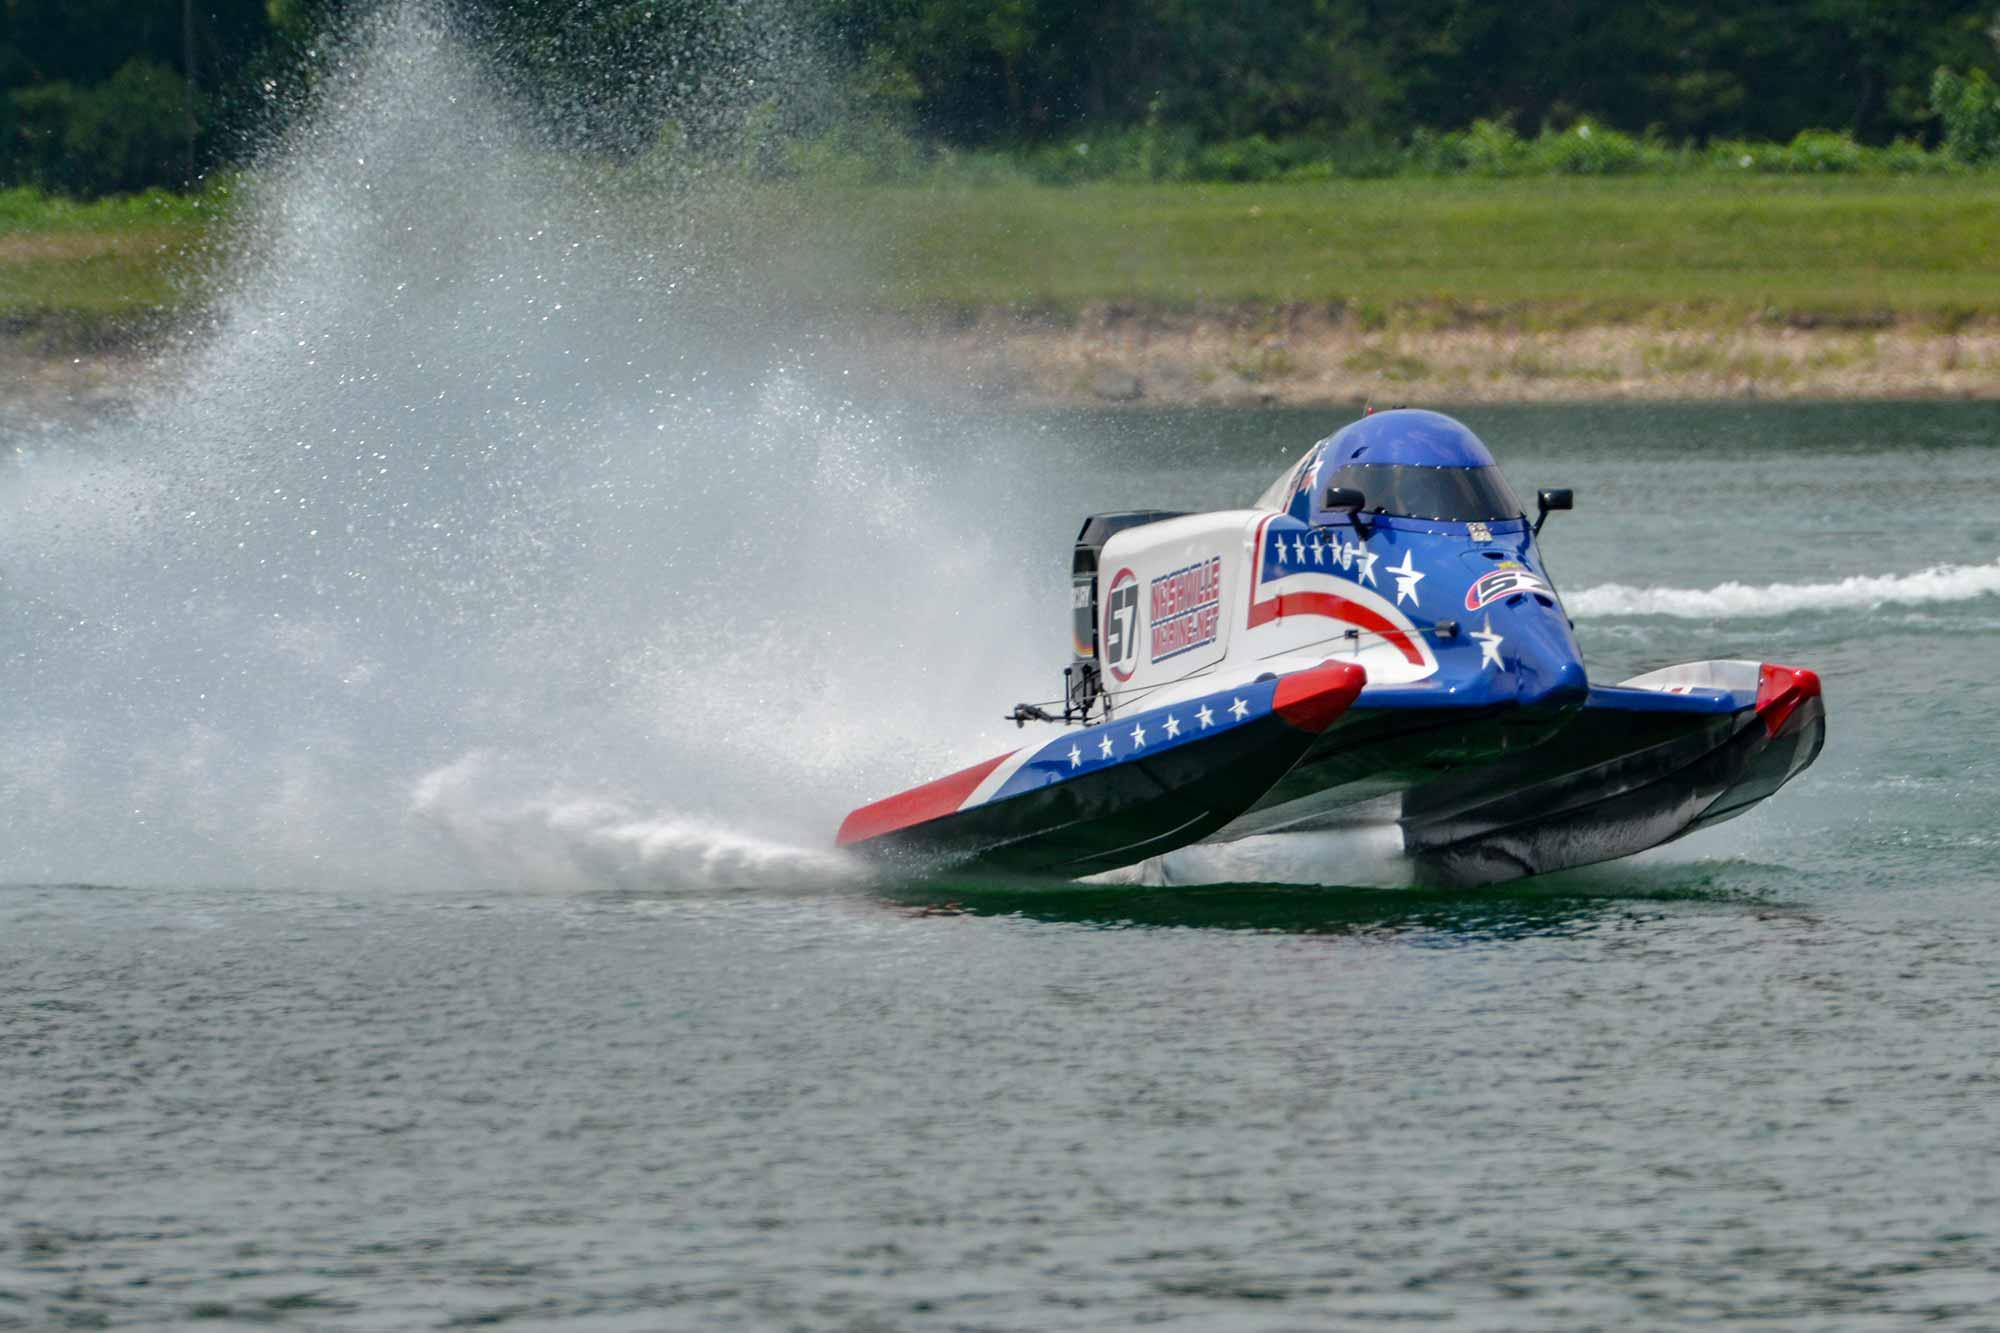 McMurray-Racing-Nashvill-Marine-2021-Springfield-F1-Race-7